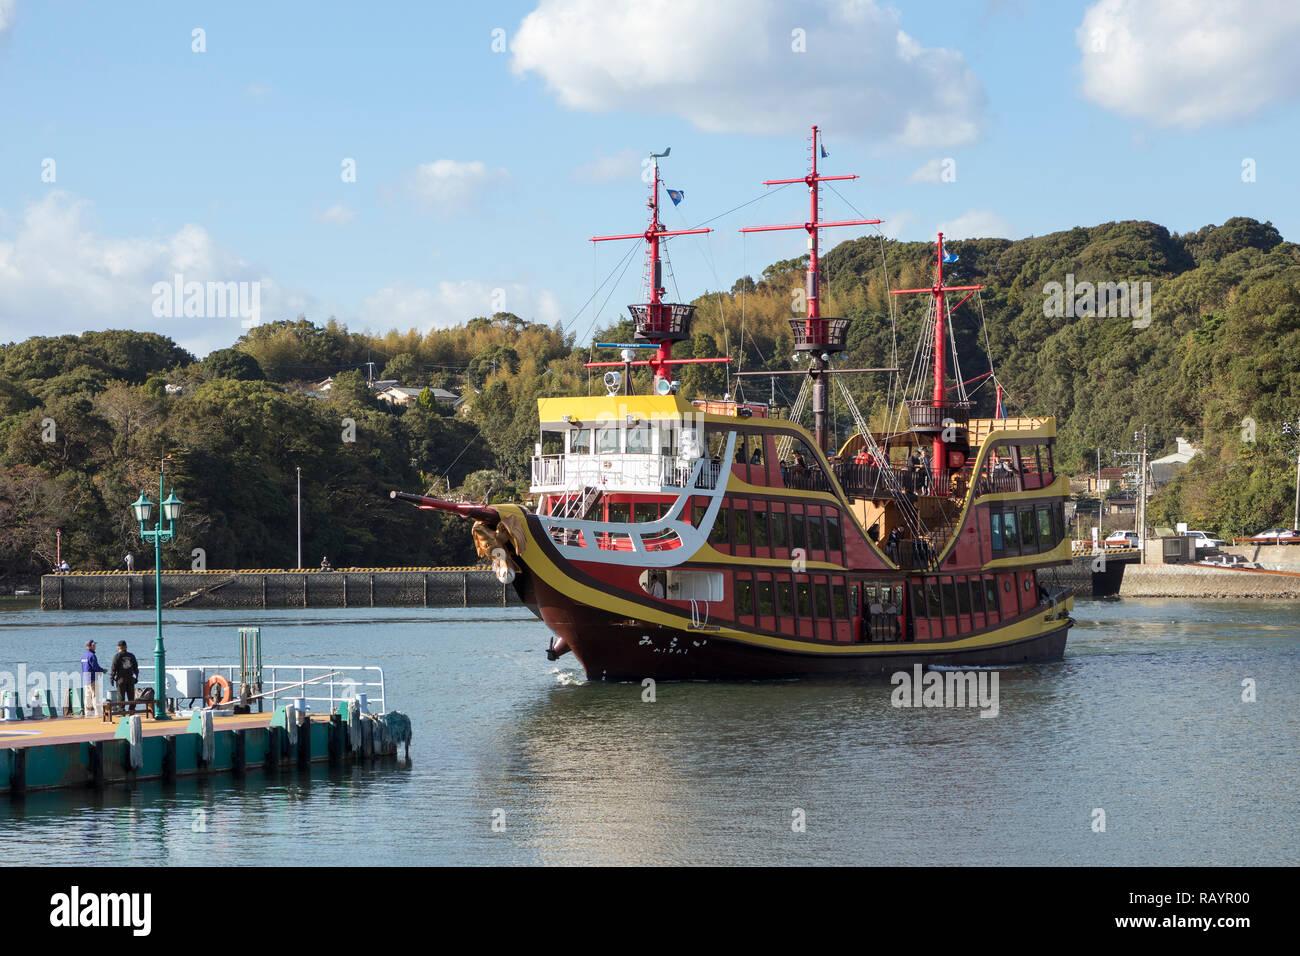 Sasebo, Japan - October 28, 2018: Kaio, historical passenger ship, tour boat for Kujuku island - Stock Image